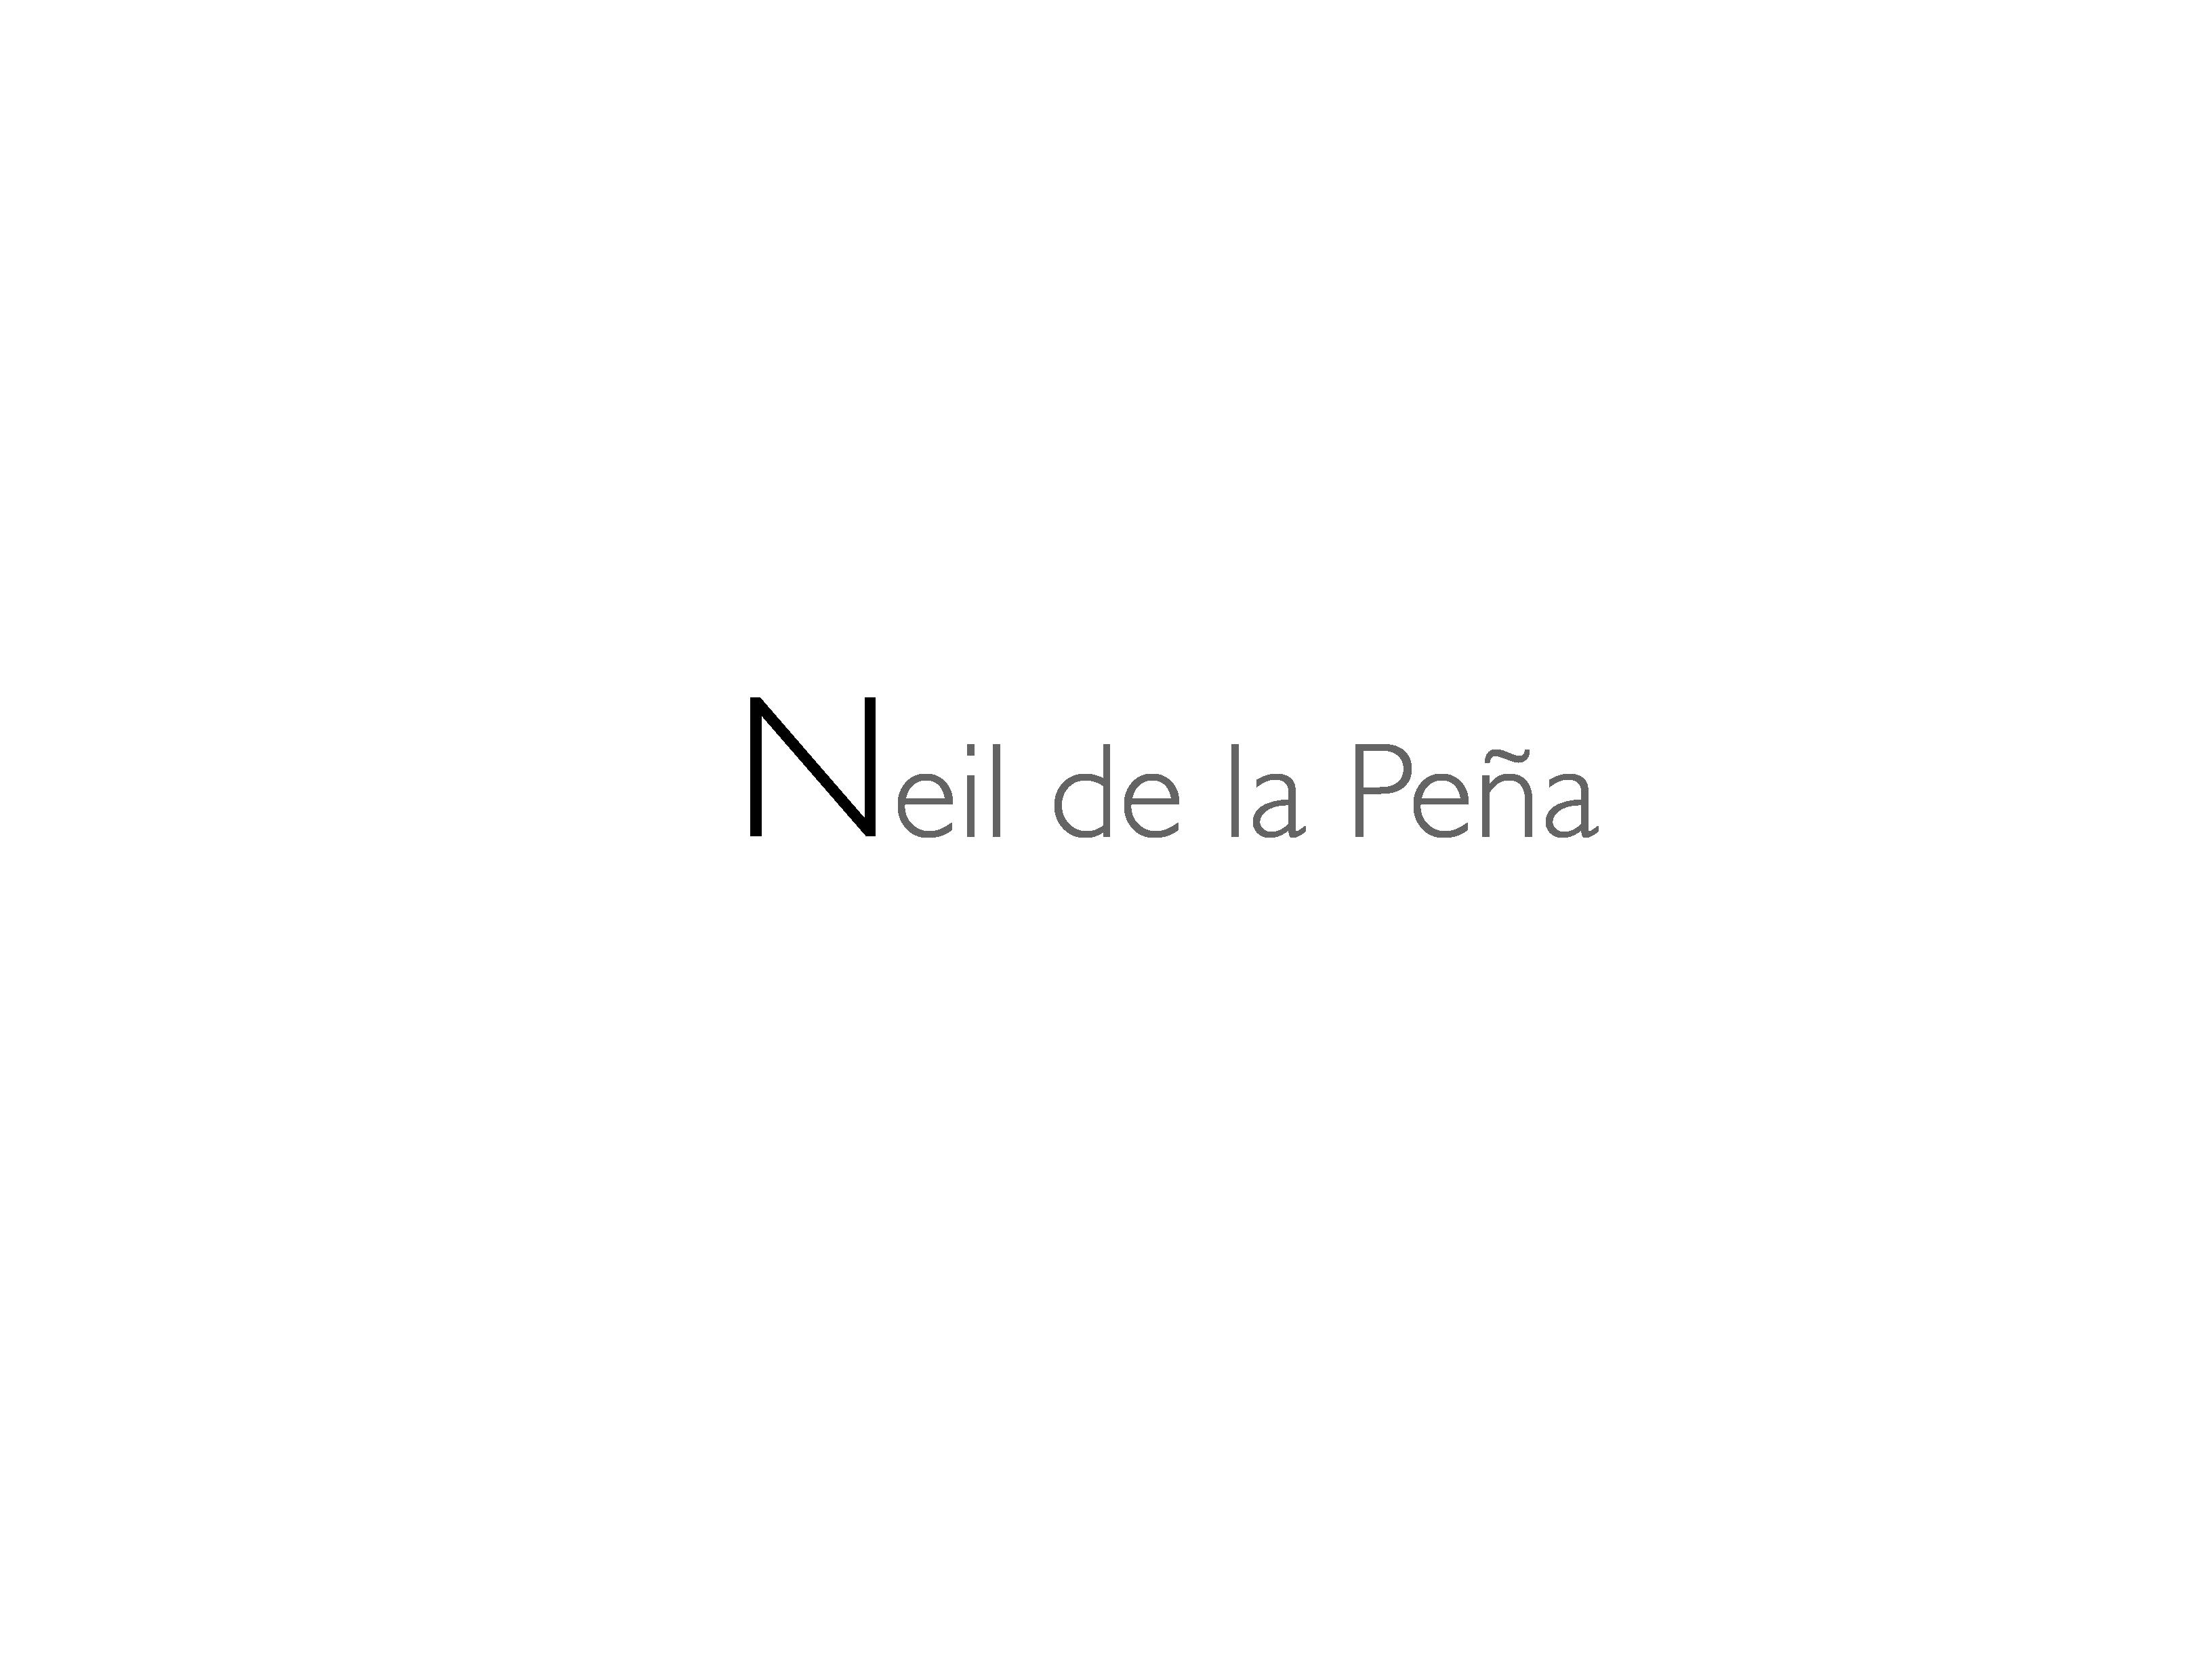 Neil de la Peña's Signature